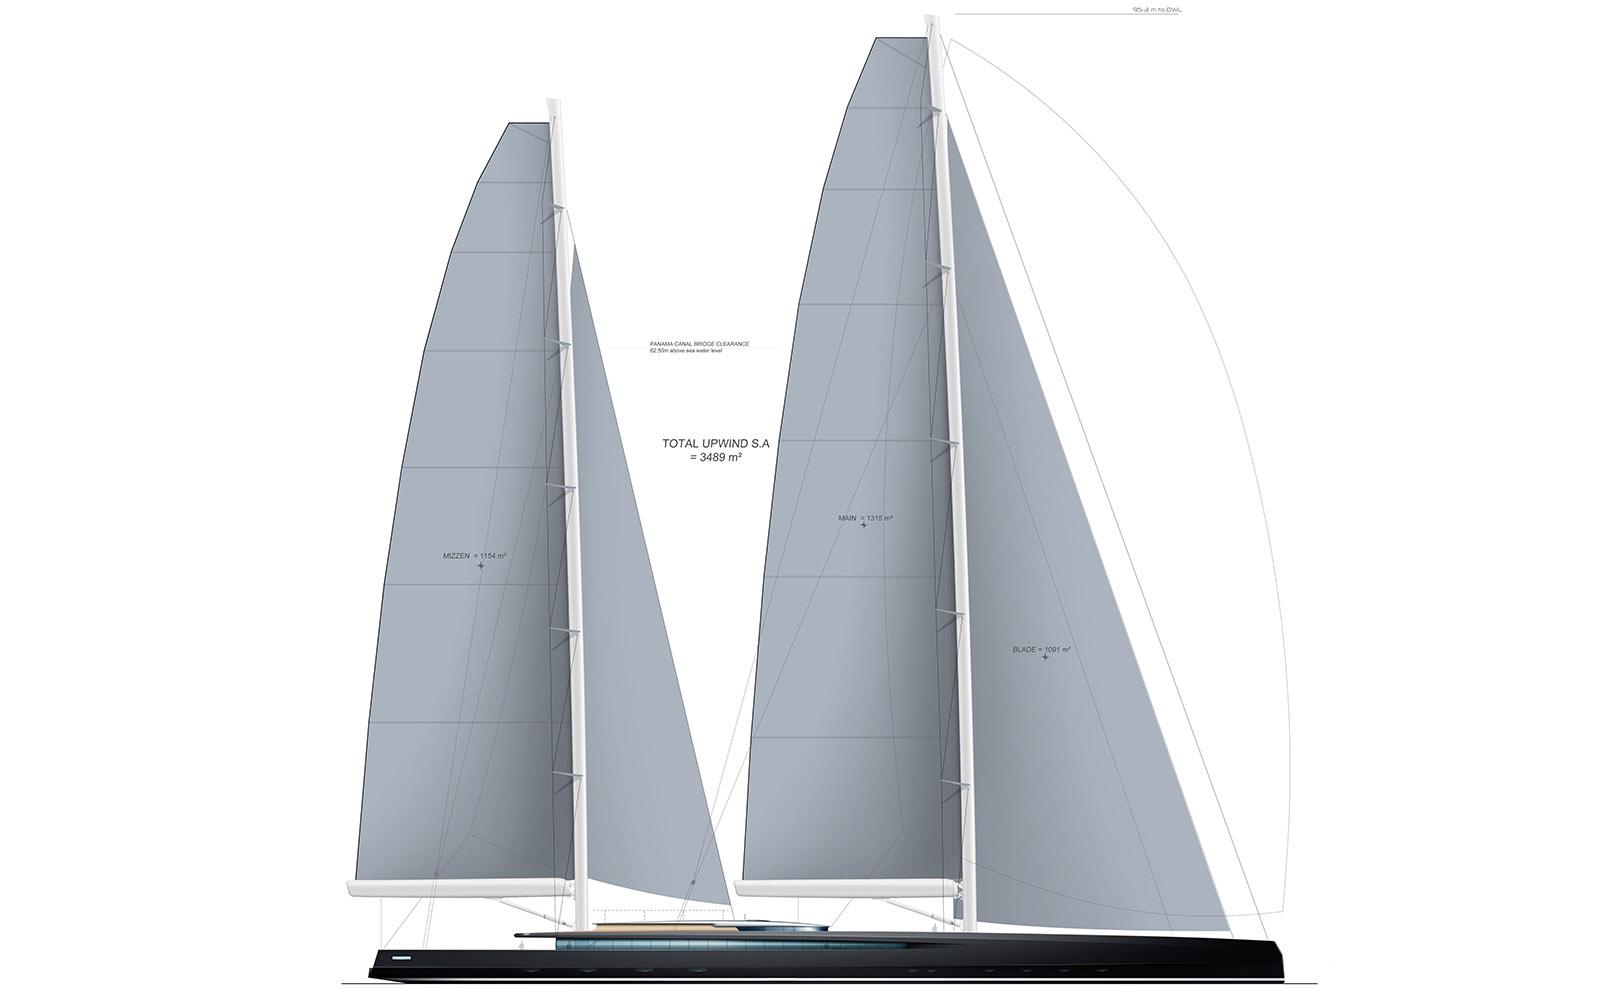 Super veleiro SY300 sailplan - boat shopping